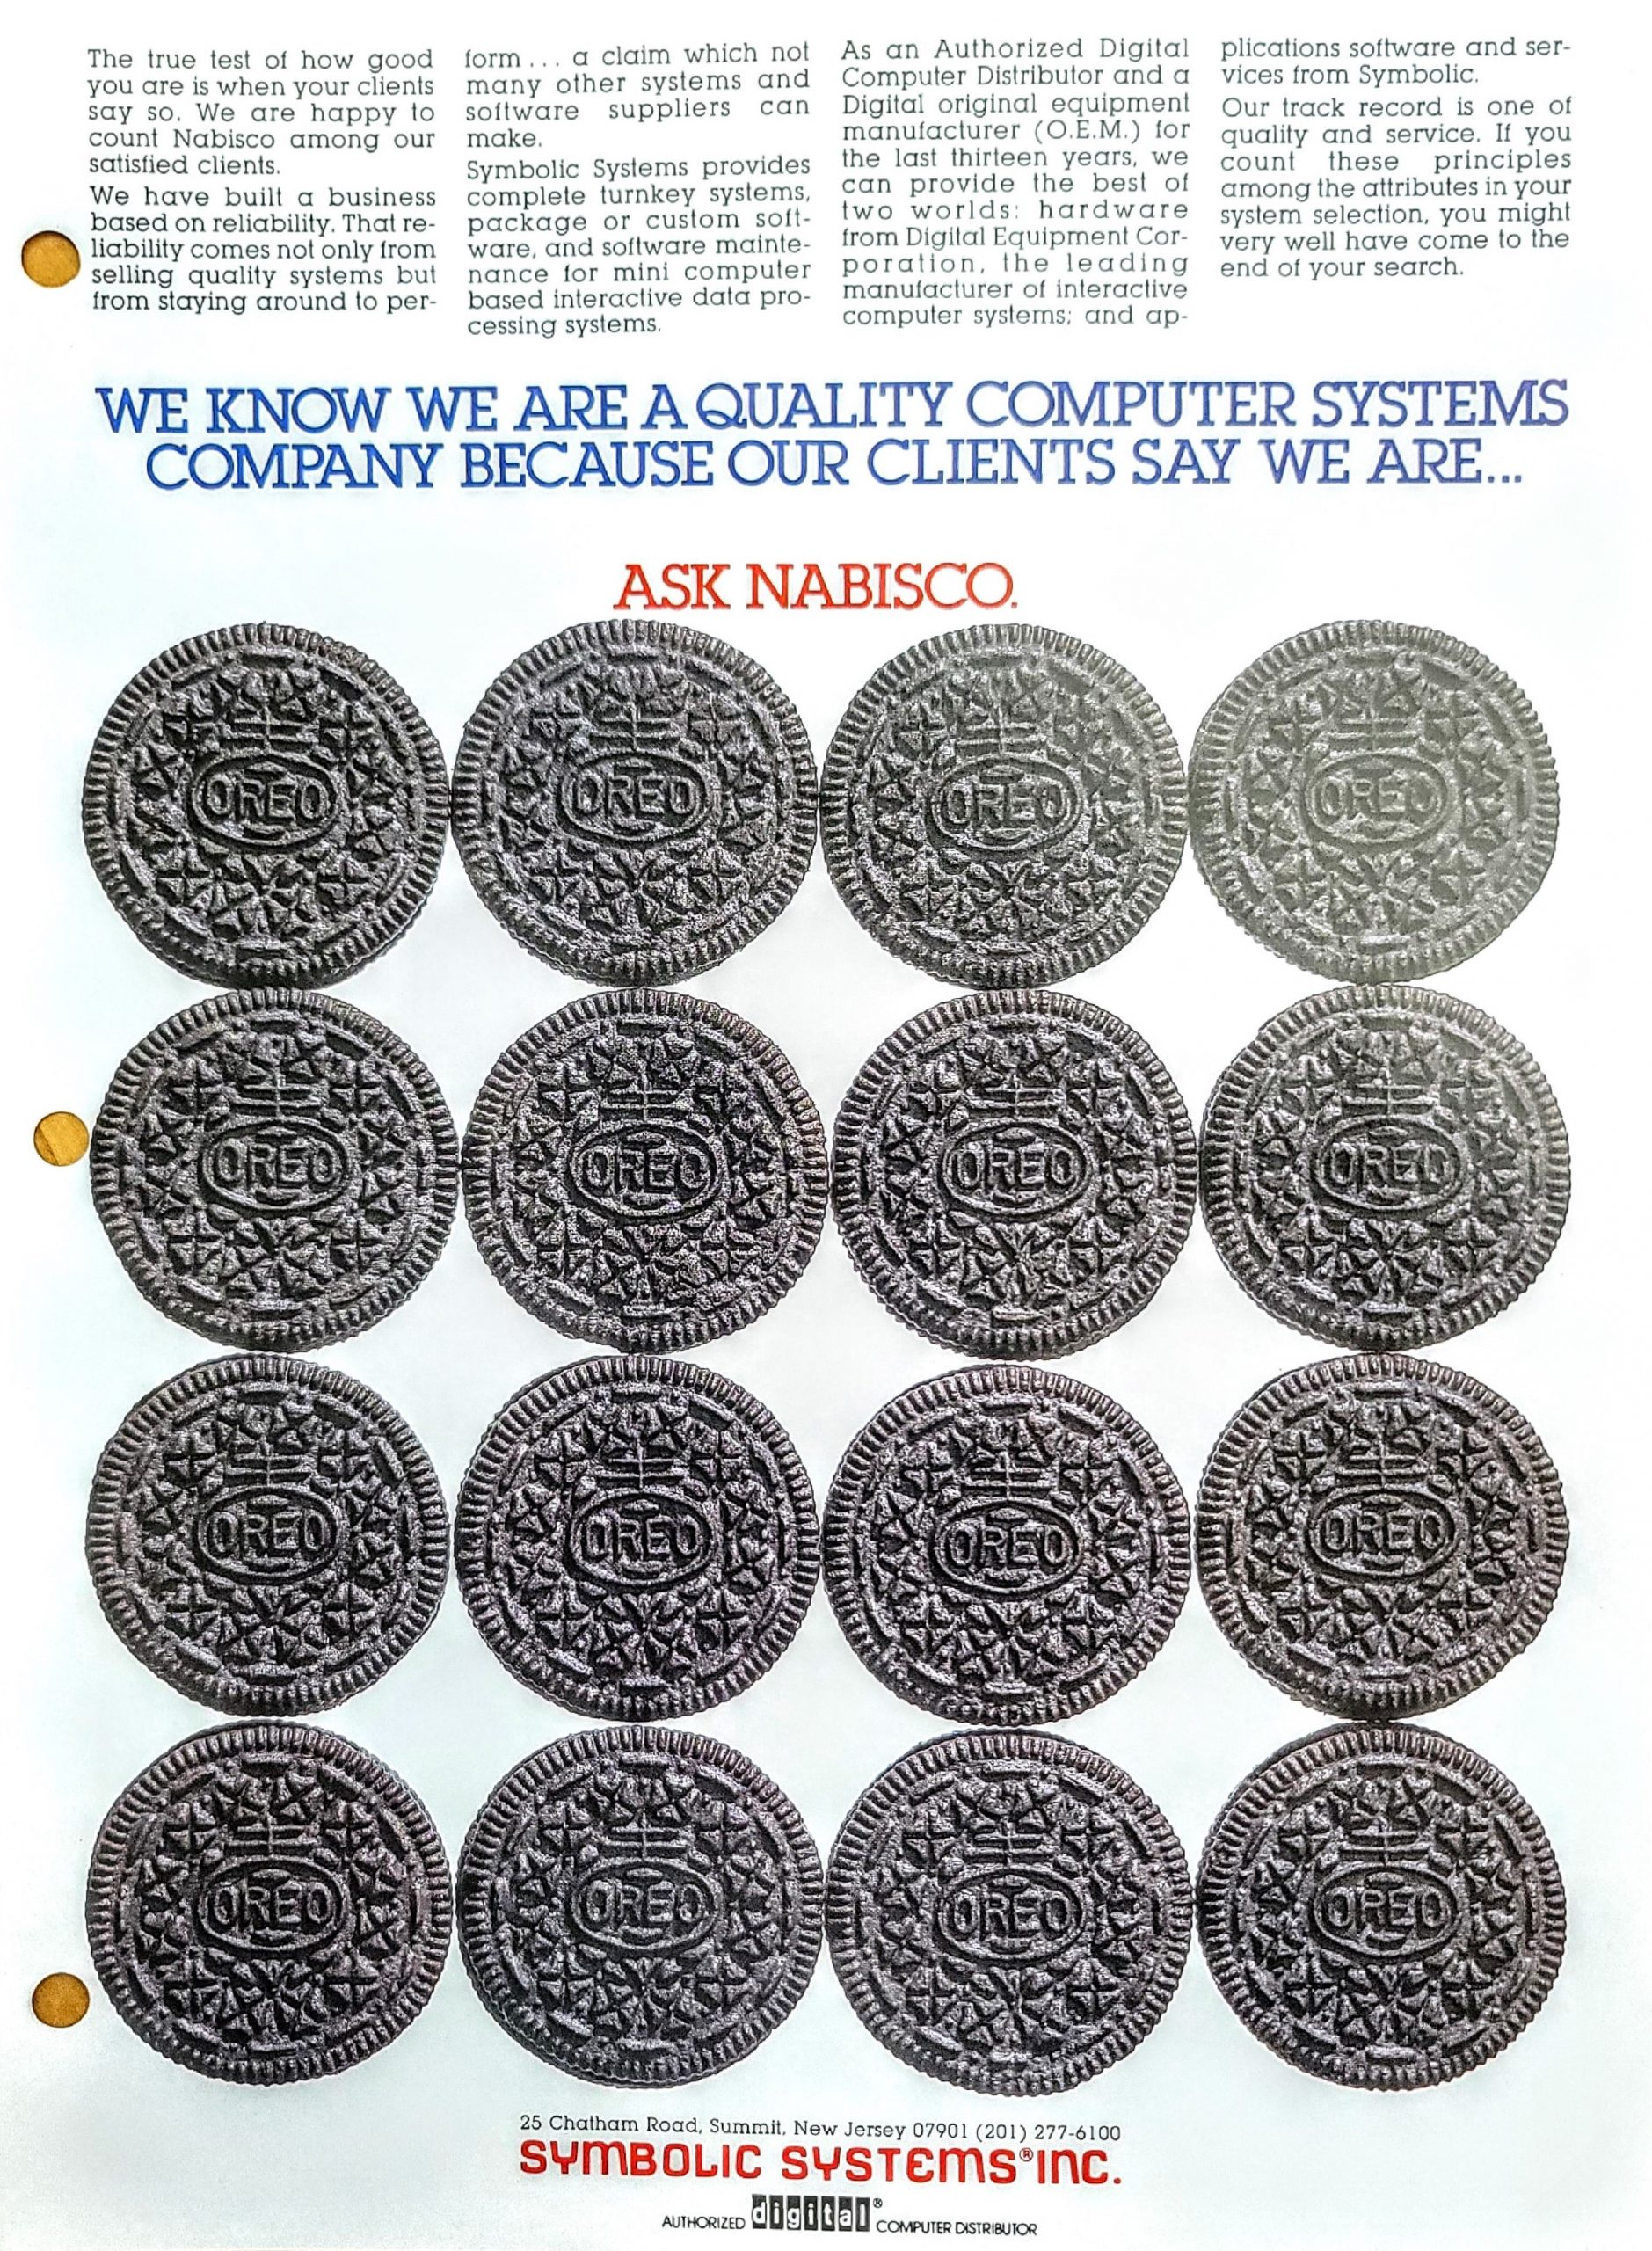 symbolic systems_ask nabisco_ad_1